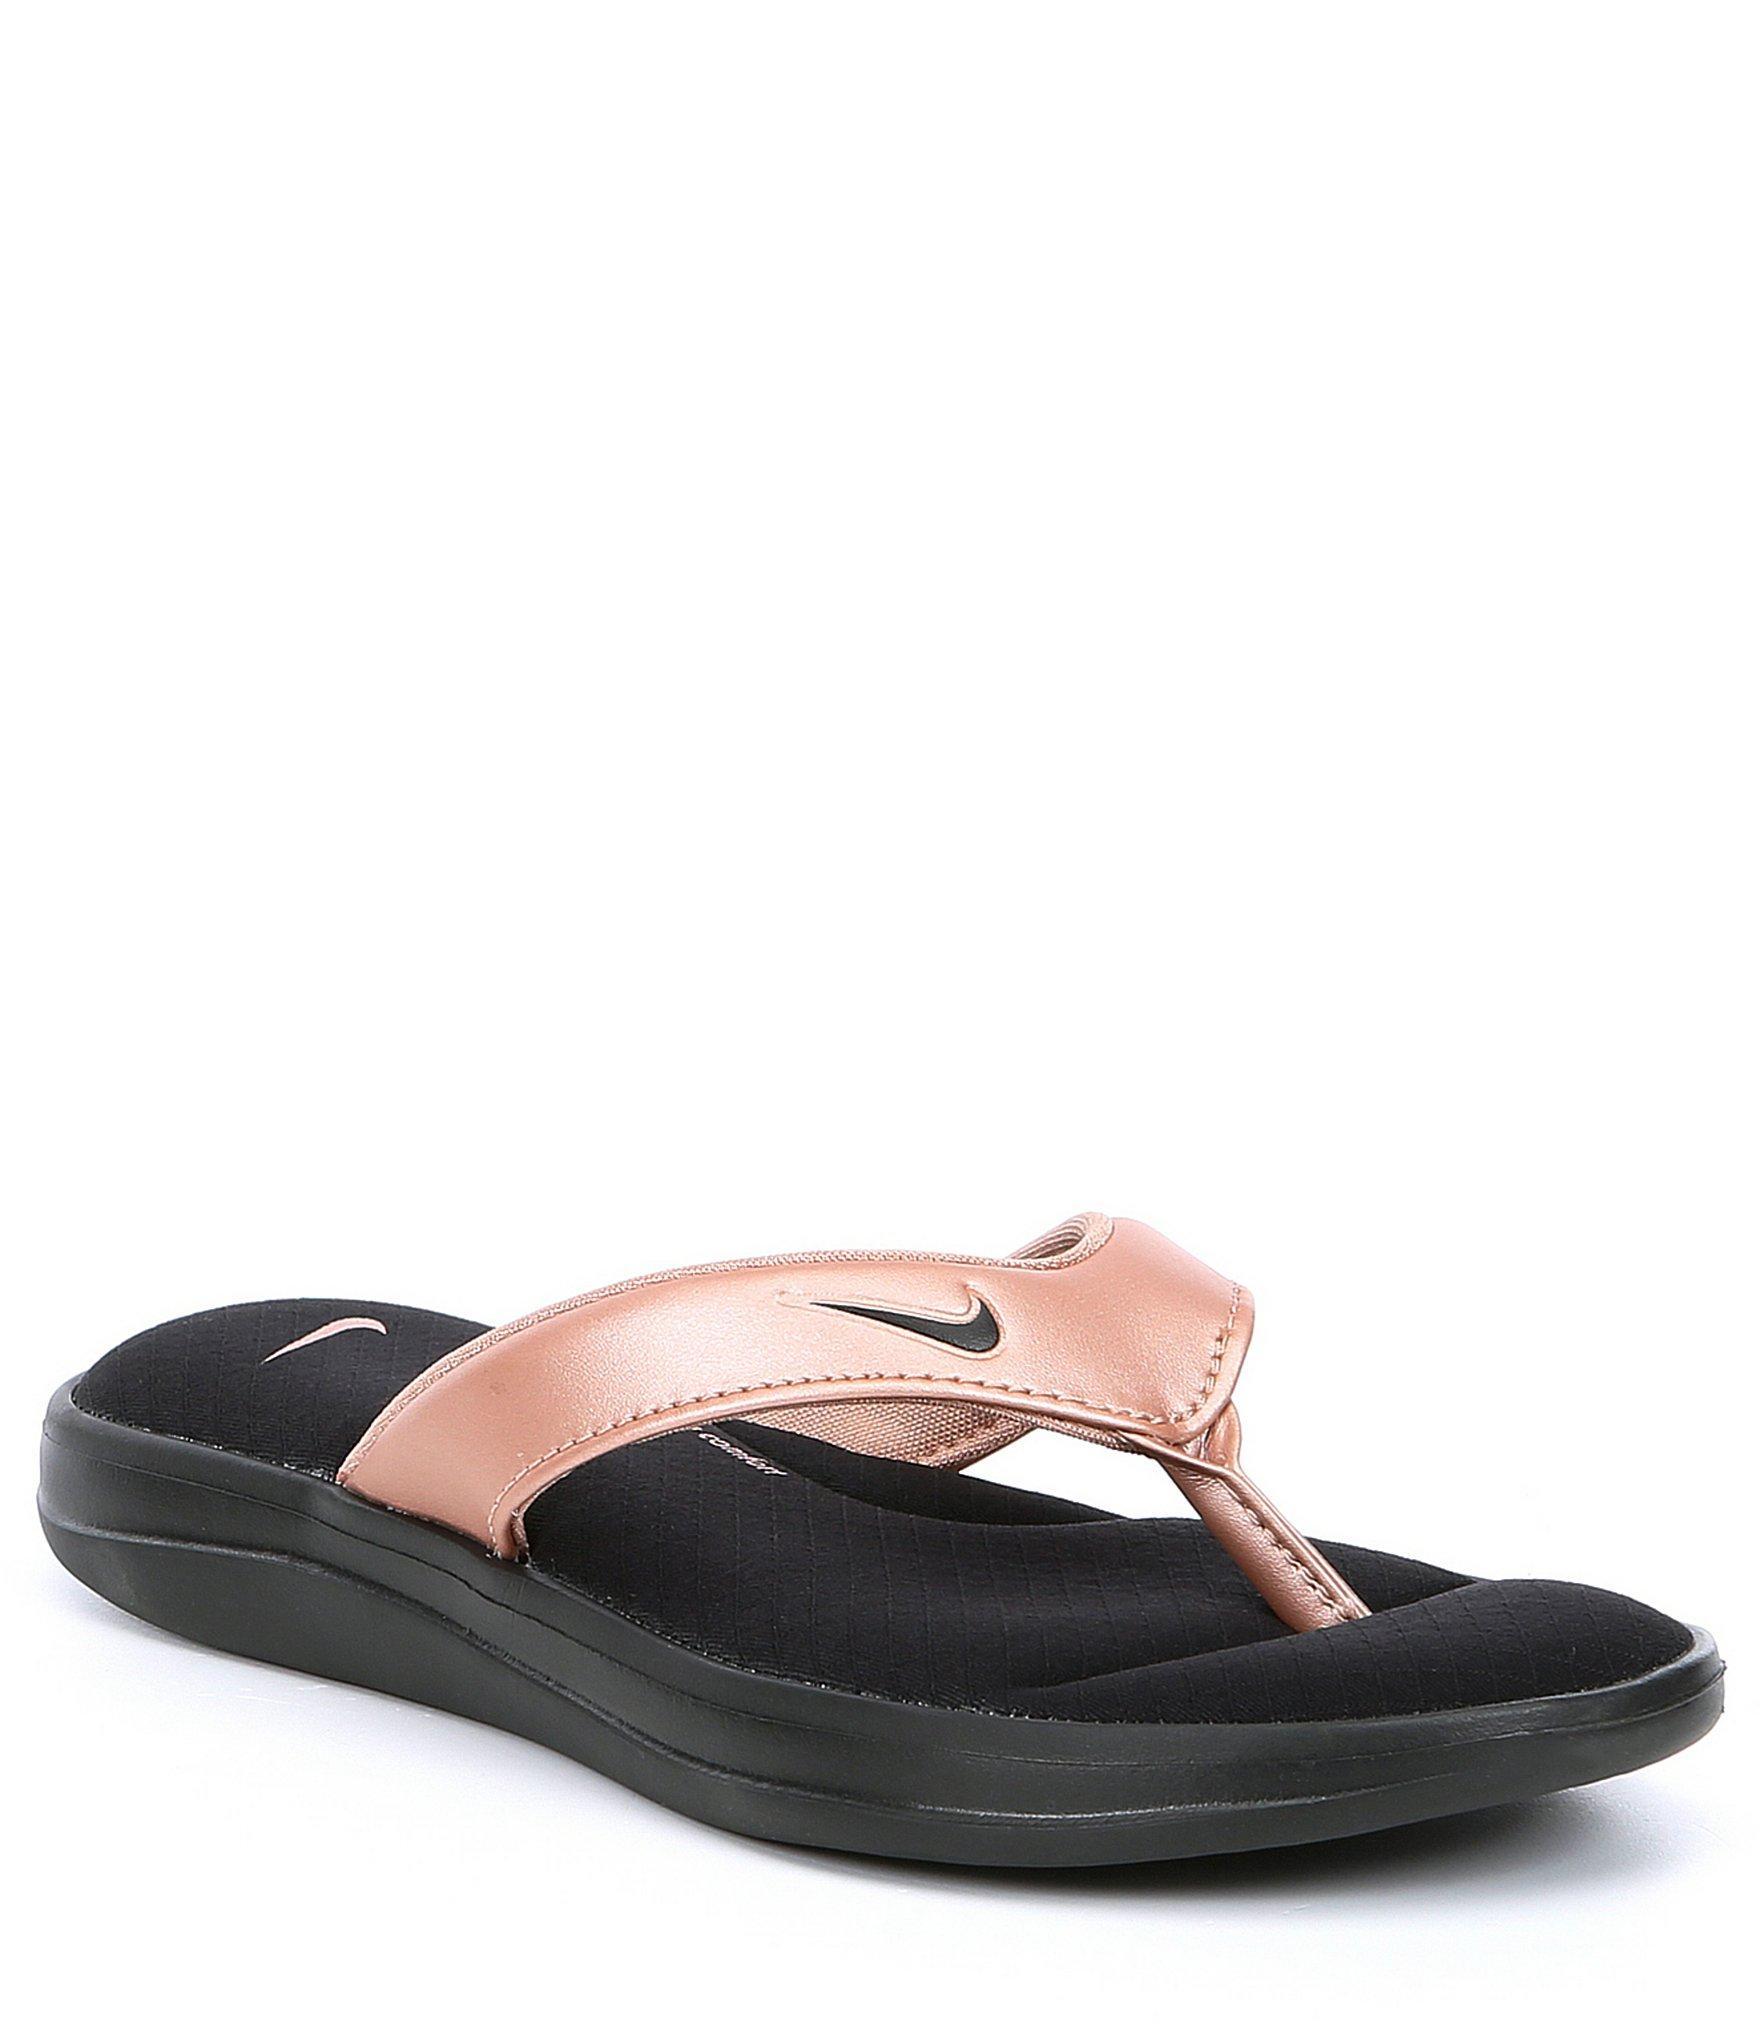 582a5baac3e Lyst - Nike Women s Ultra Comfort 3 Thong in Black